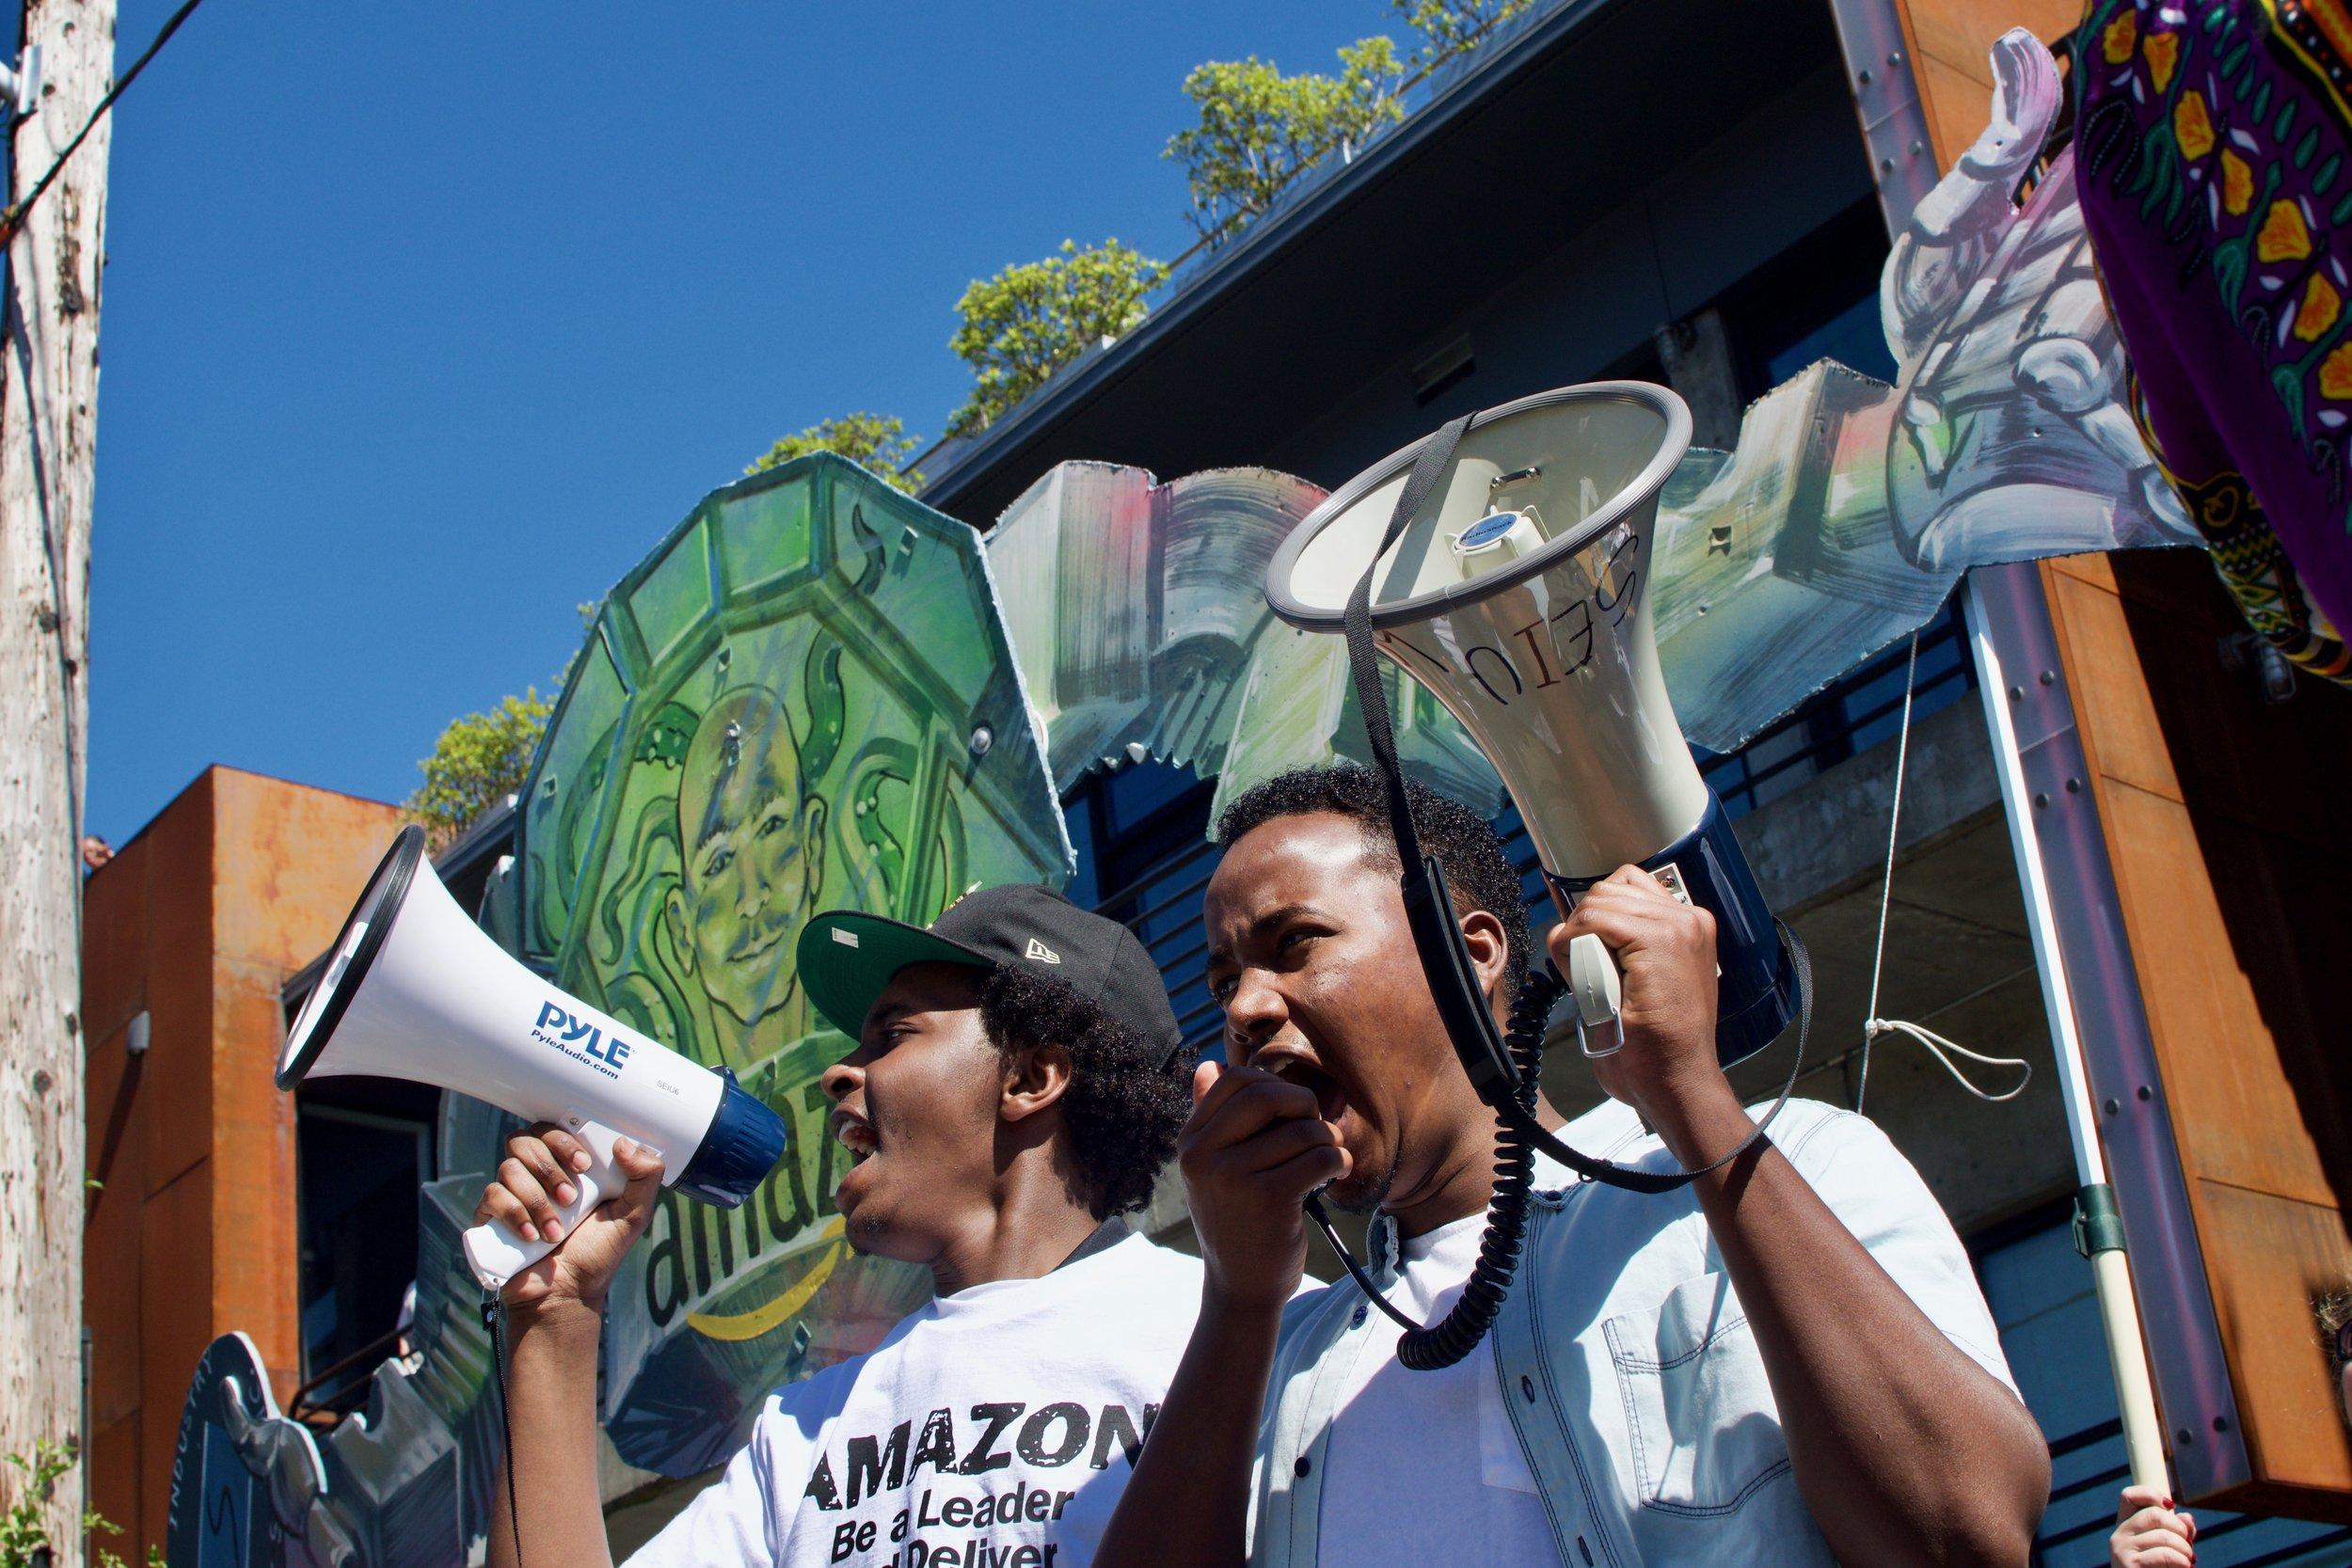 Muslim security guards lodge complaints against Amazon for discrimination